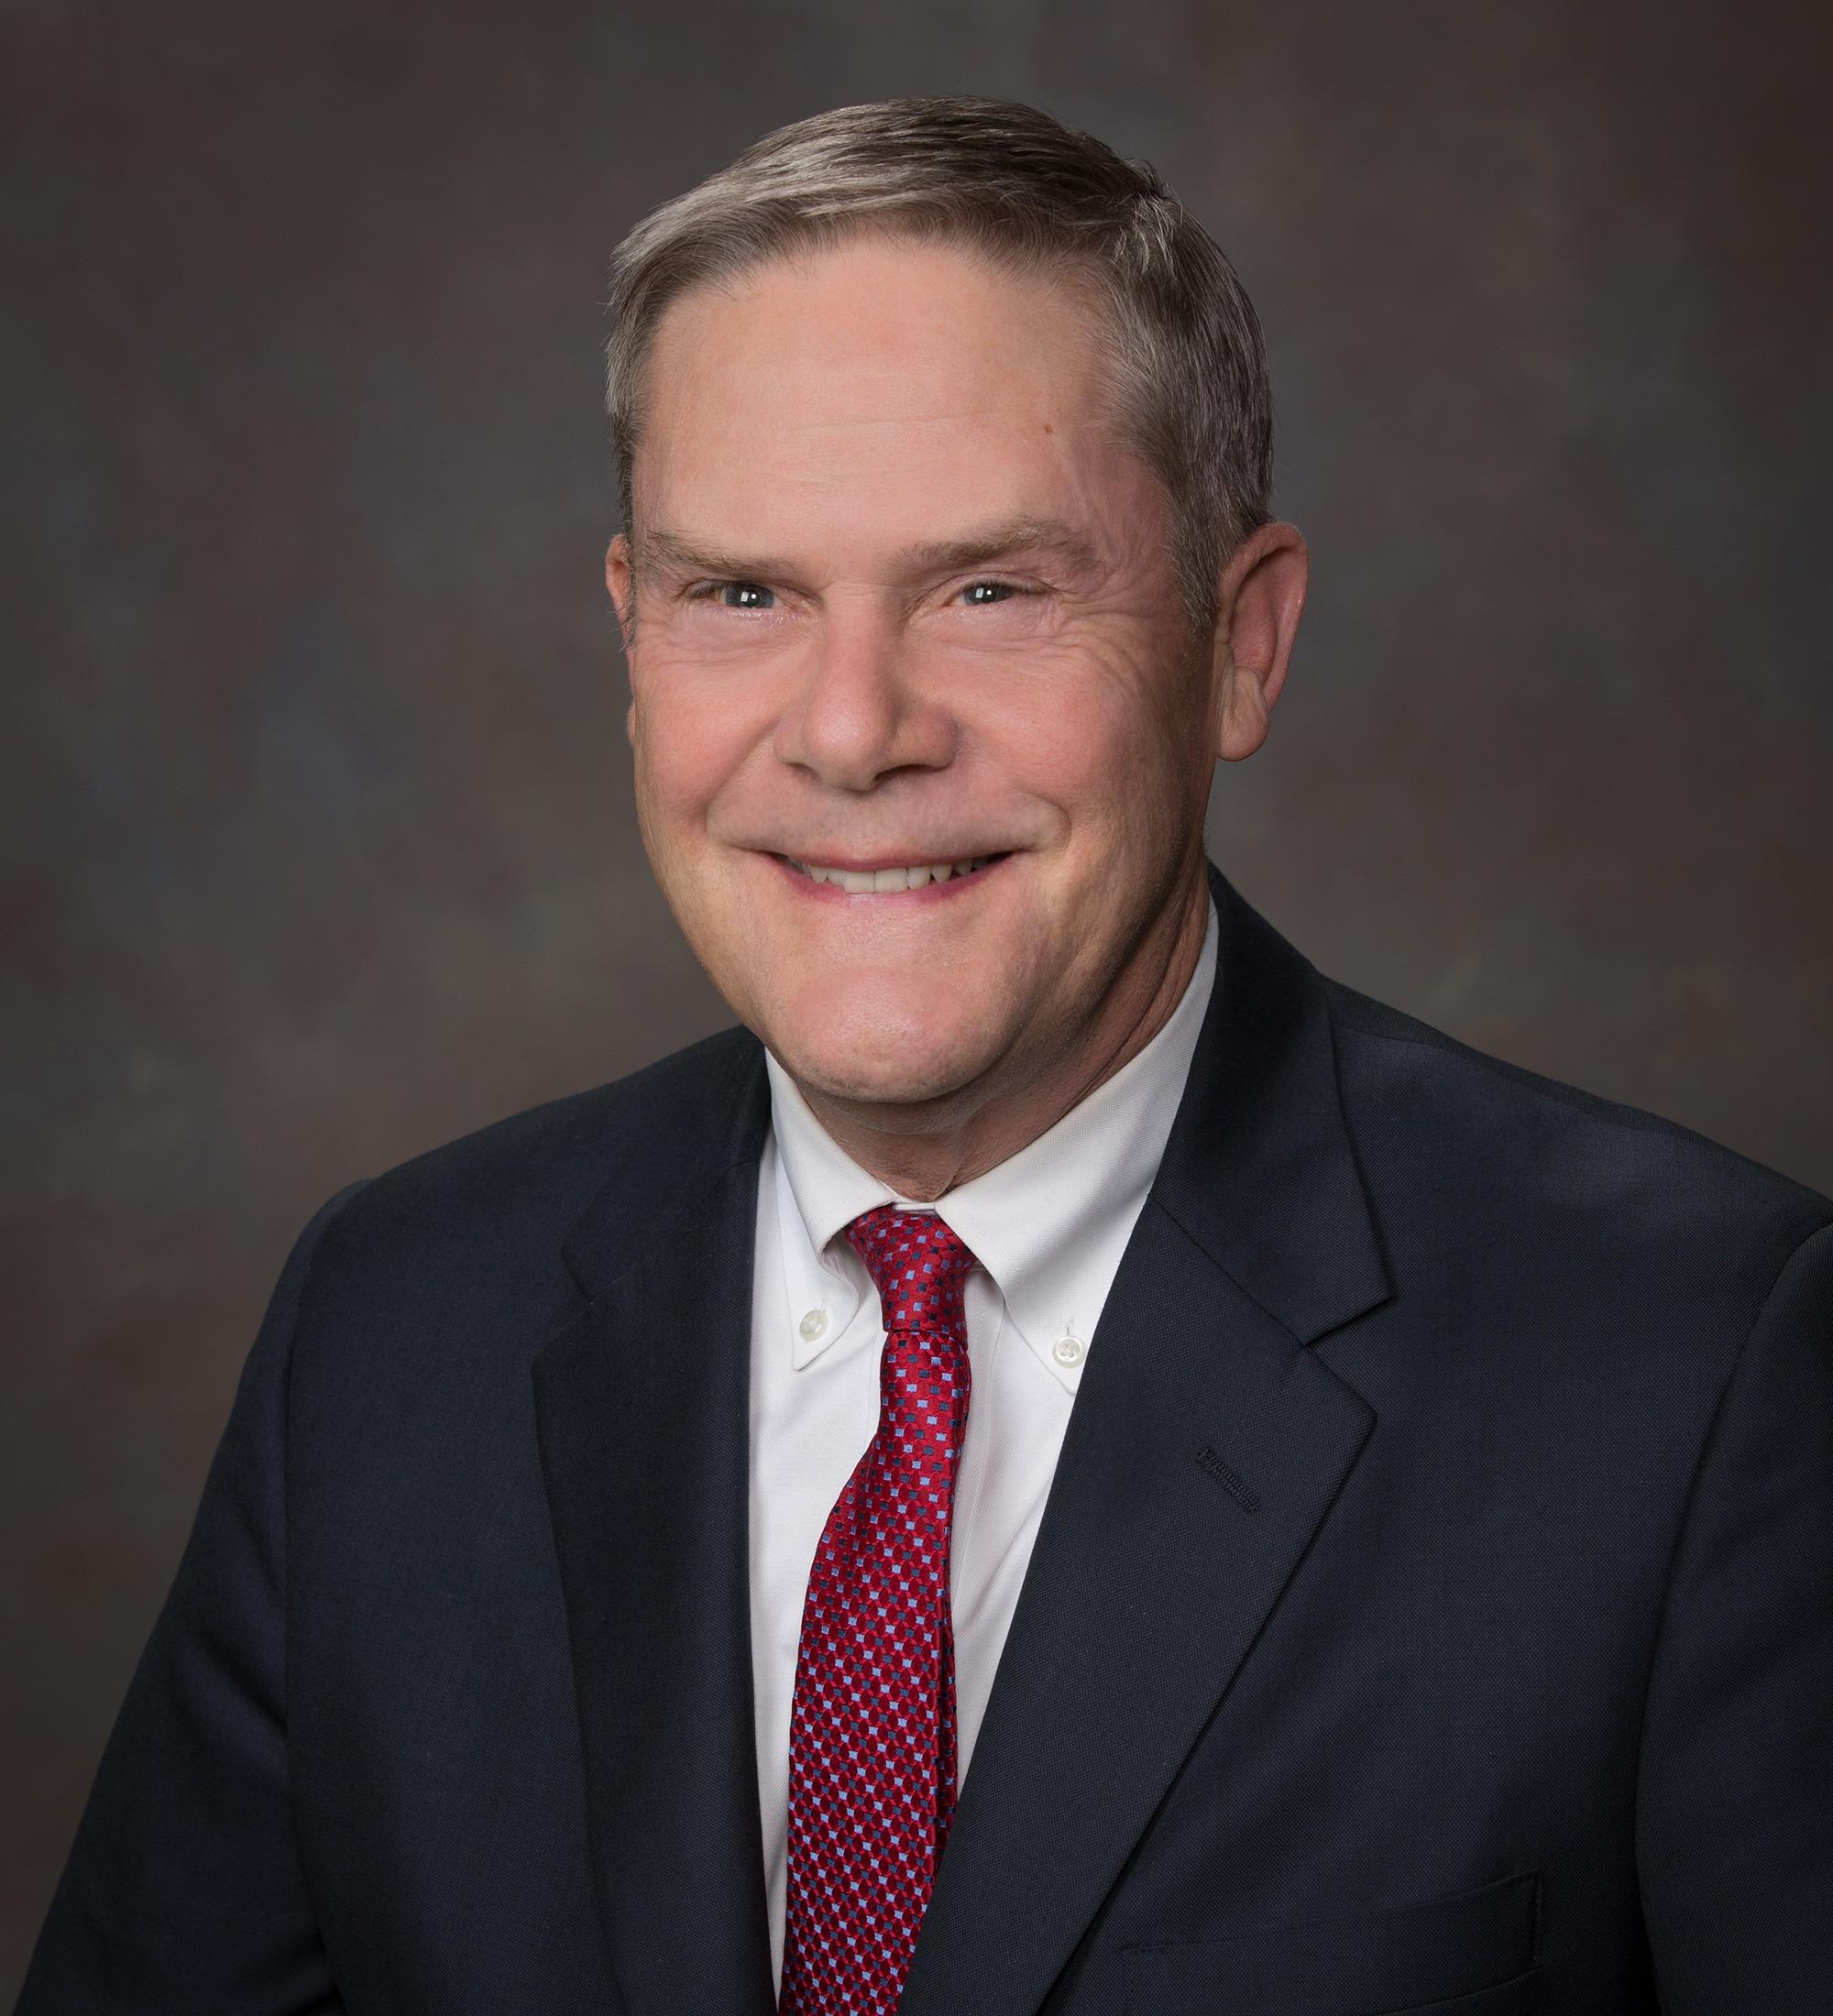 Patrick K. Kinnally's Profile Image